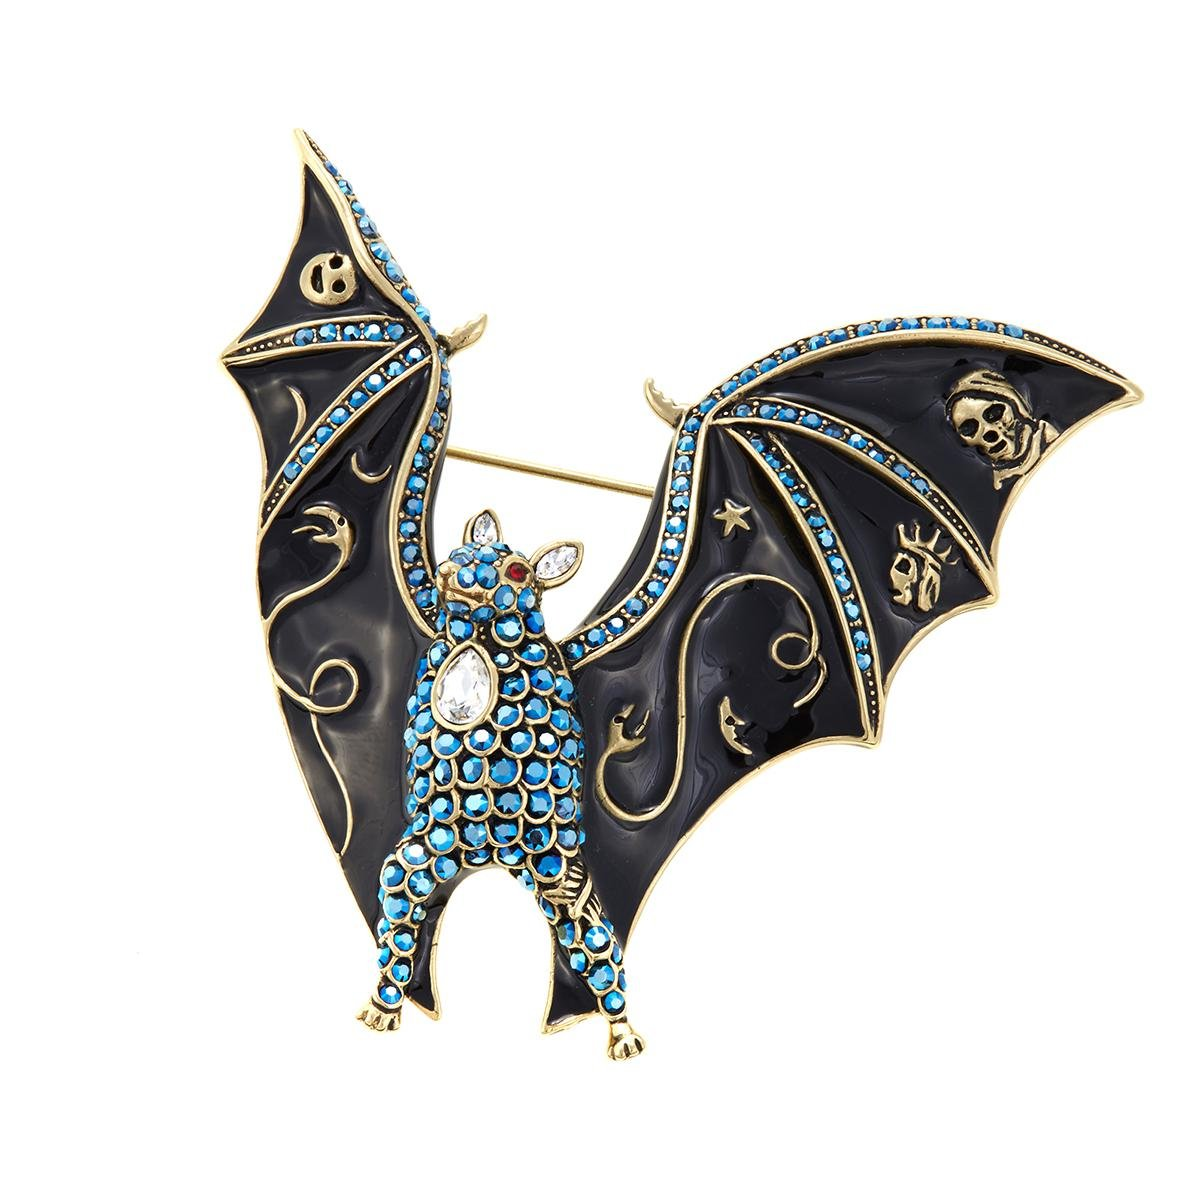 Heidi Daus Boo-tiful-Bat-Crystal-and-Enamel-Pin-SWAROVSKI-CRYSTALS-GRAB-IT Boo-tiful-Bat-Crystal-and-Enamel-Pin-SWAROVSKI-CRYSTALS-GRAB-IT